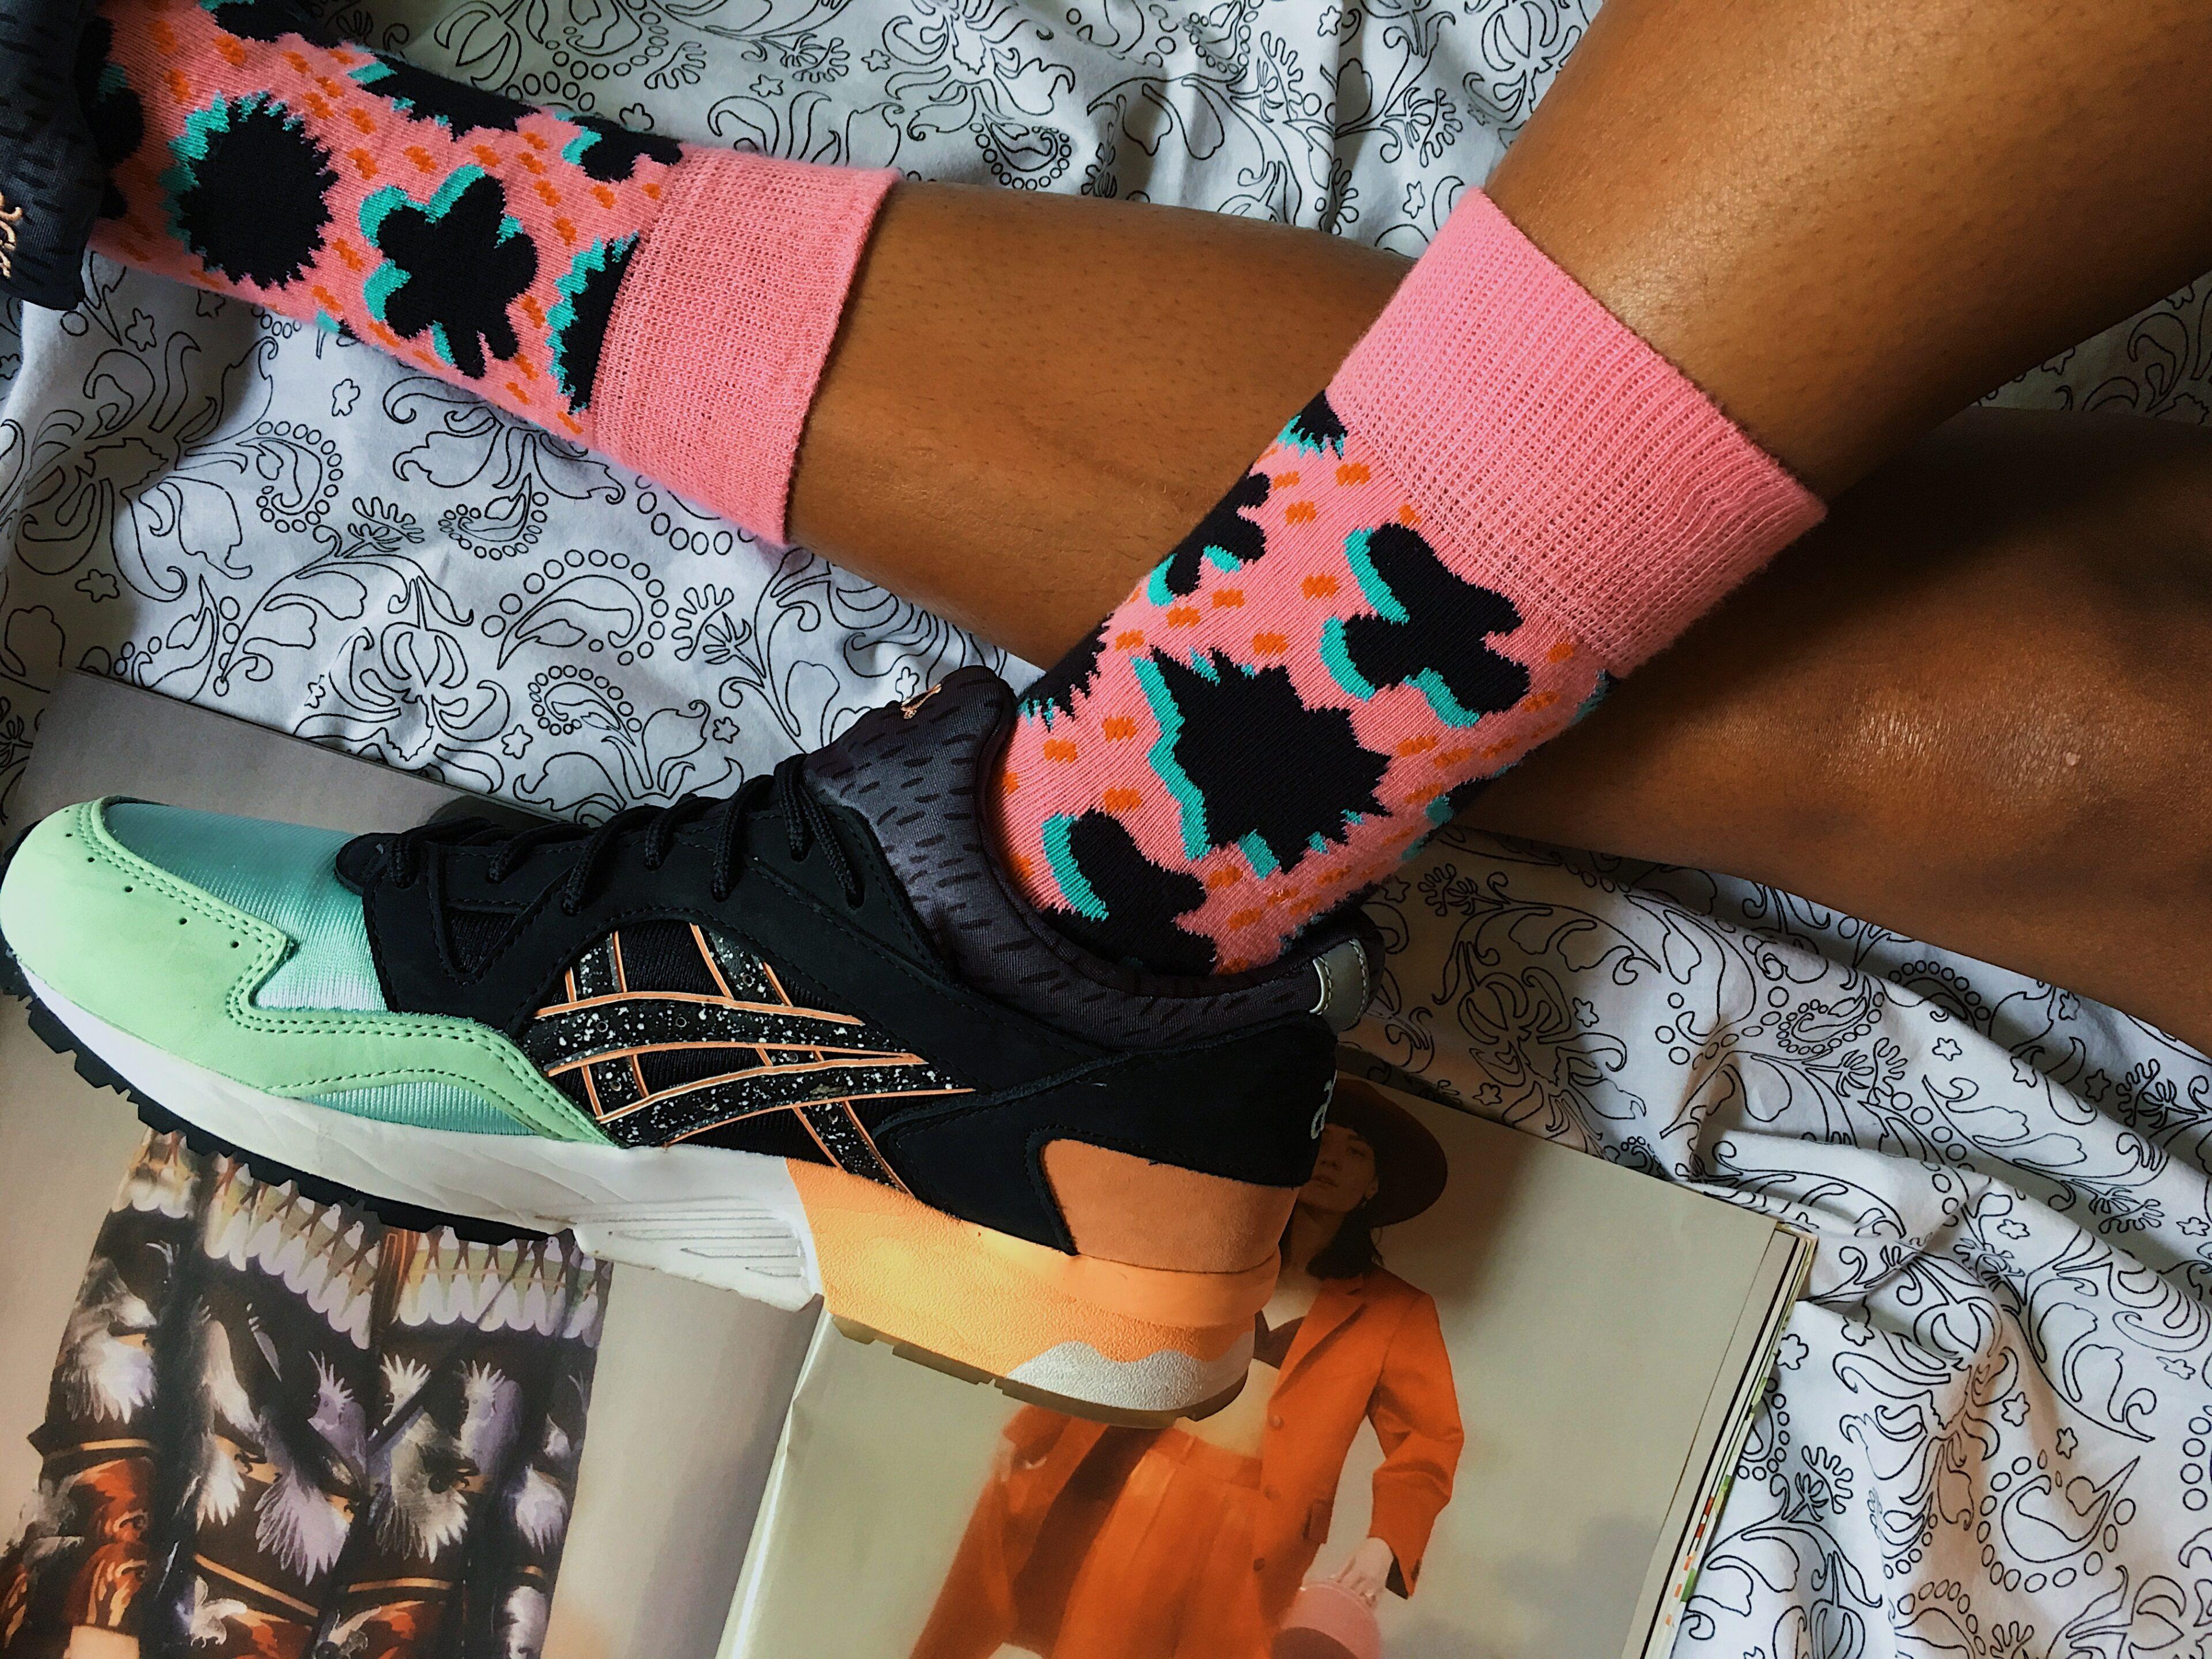 happy socks-colorful socks-asics tiger - gel lyte v-wear who you are-lcm-pink socks